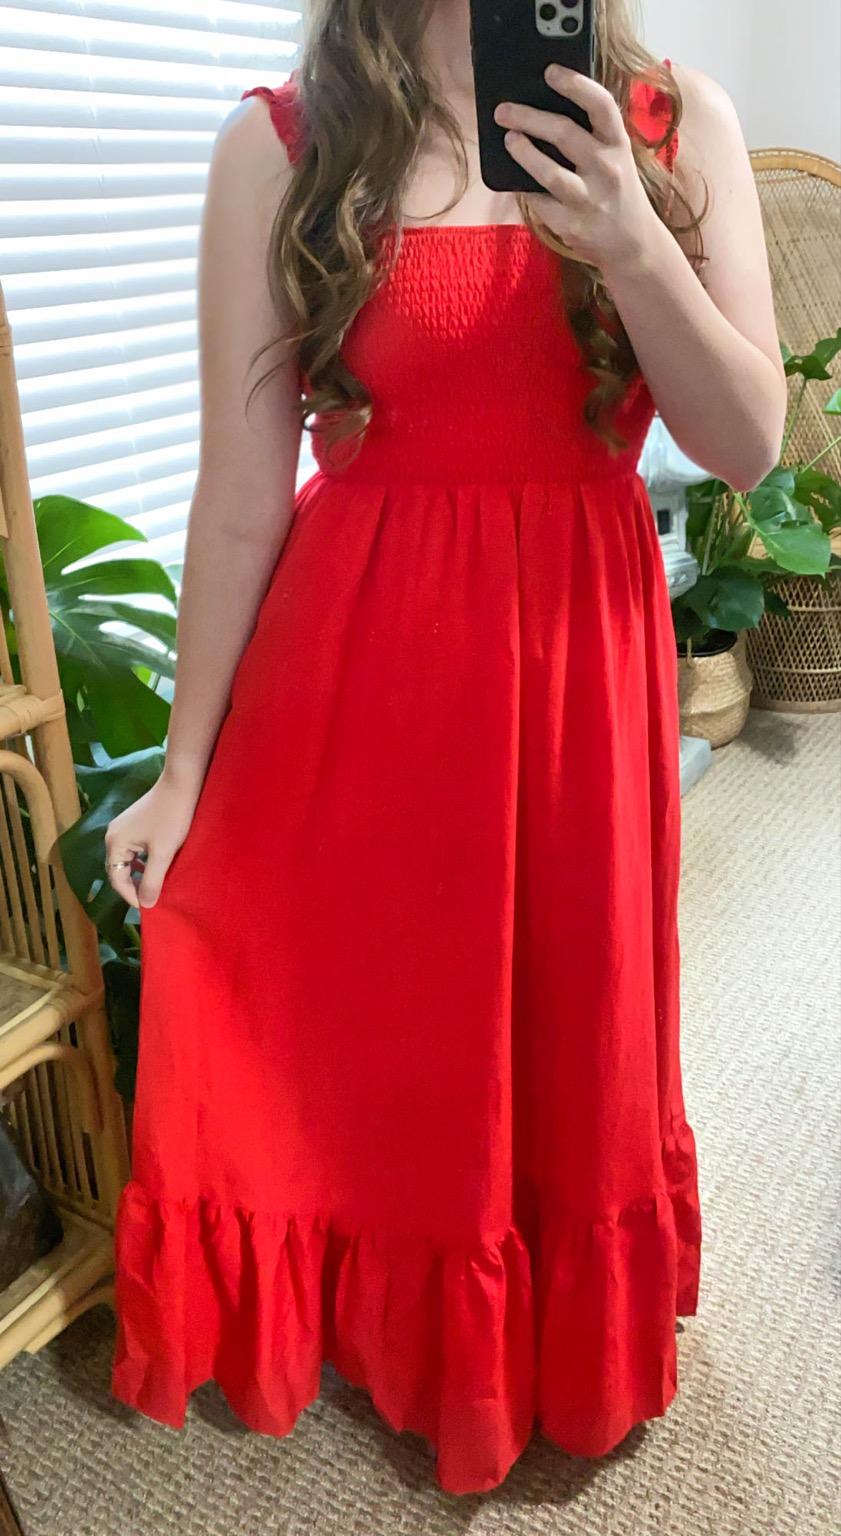 Red Ruffle Maxi from PinkBlush Women's Store Annie Fairfax